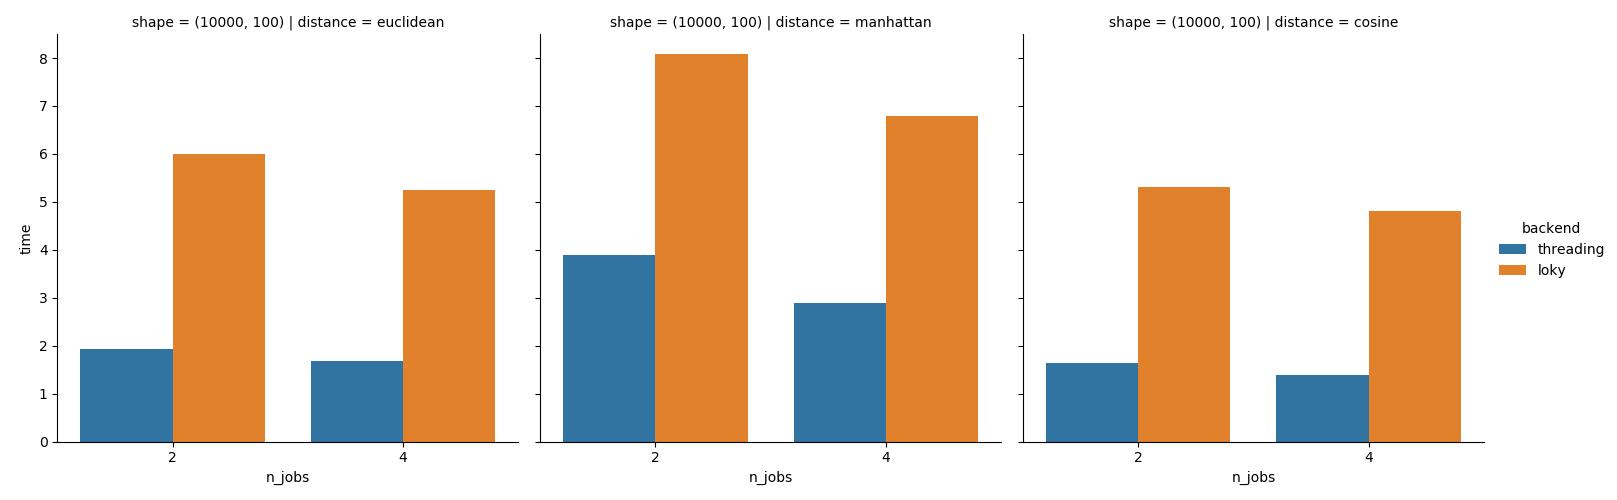 parallel_pairwise_plot